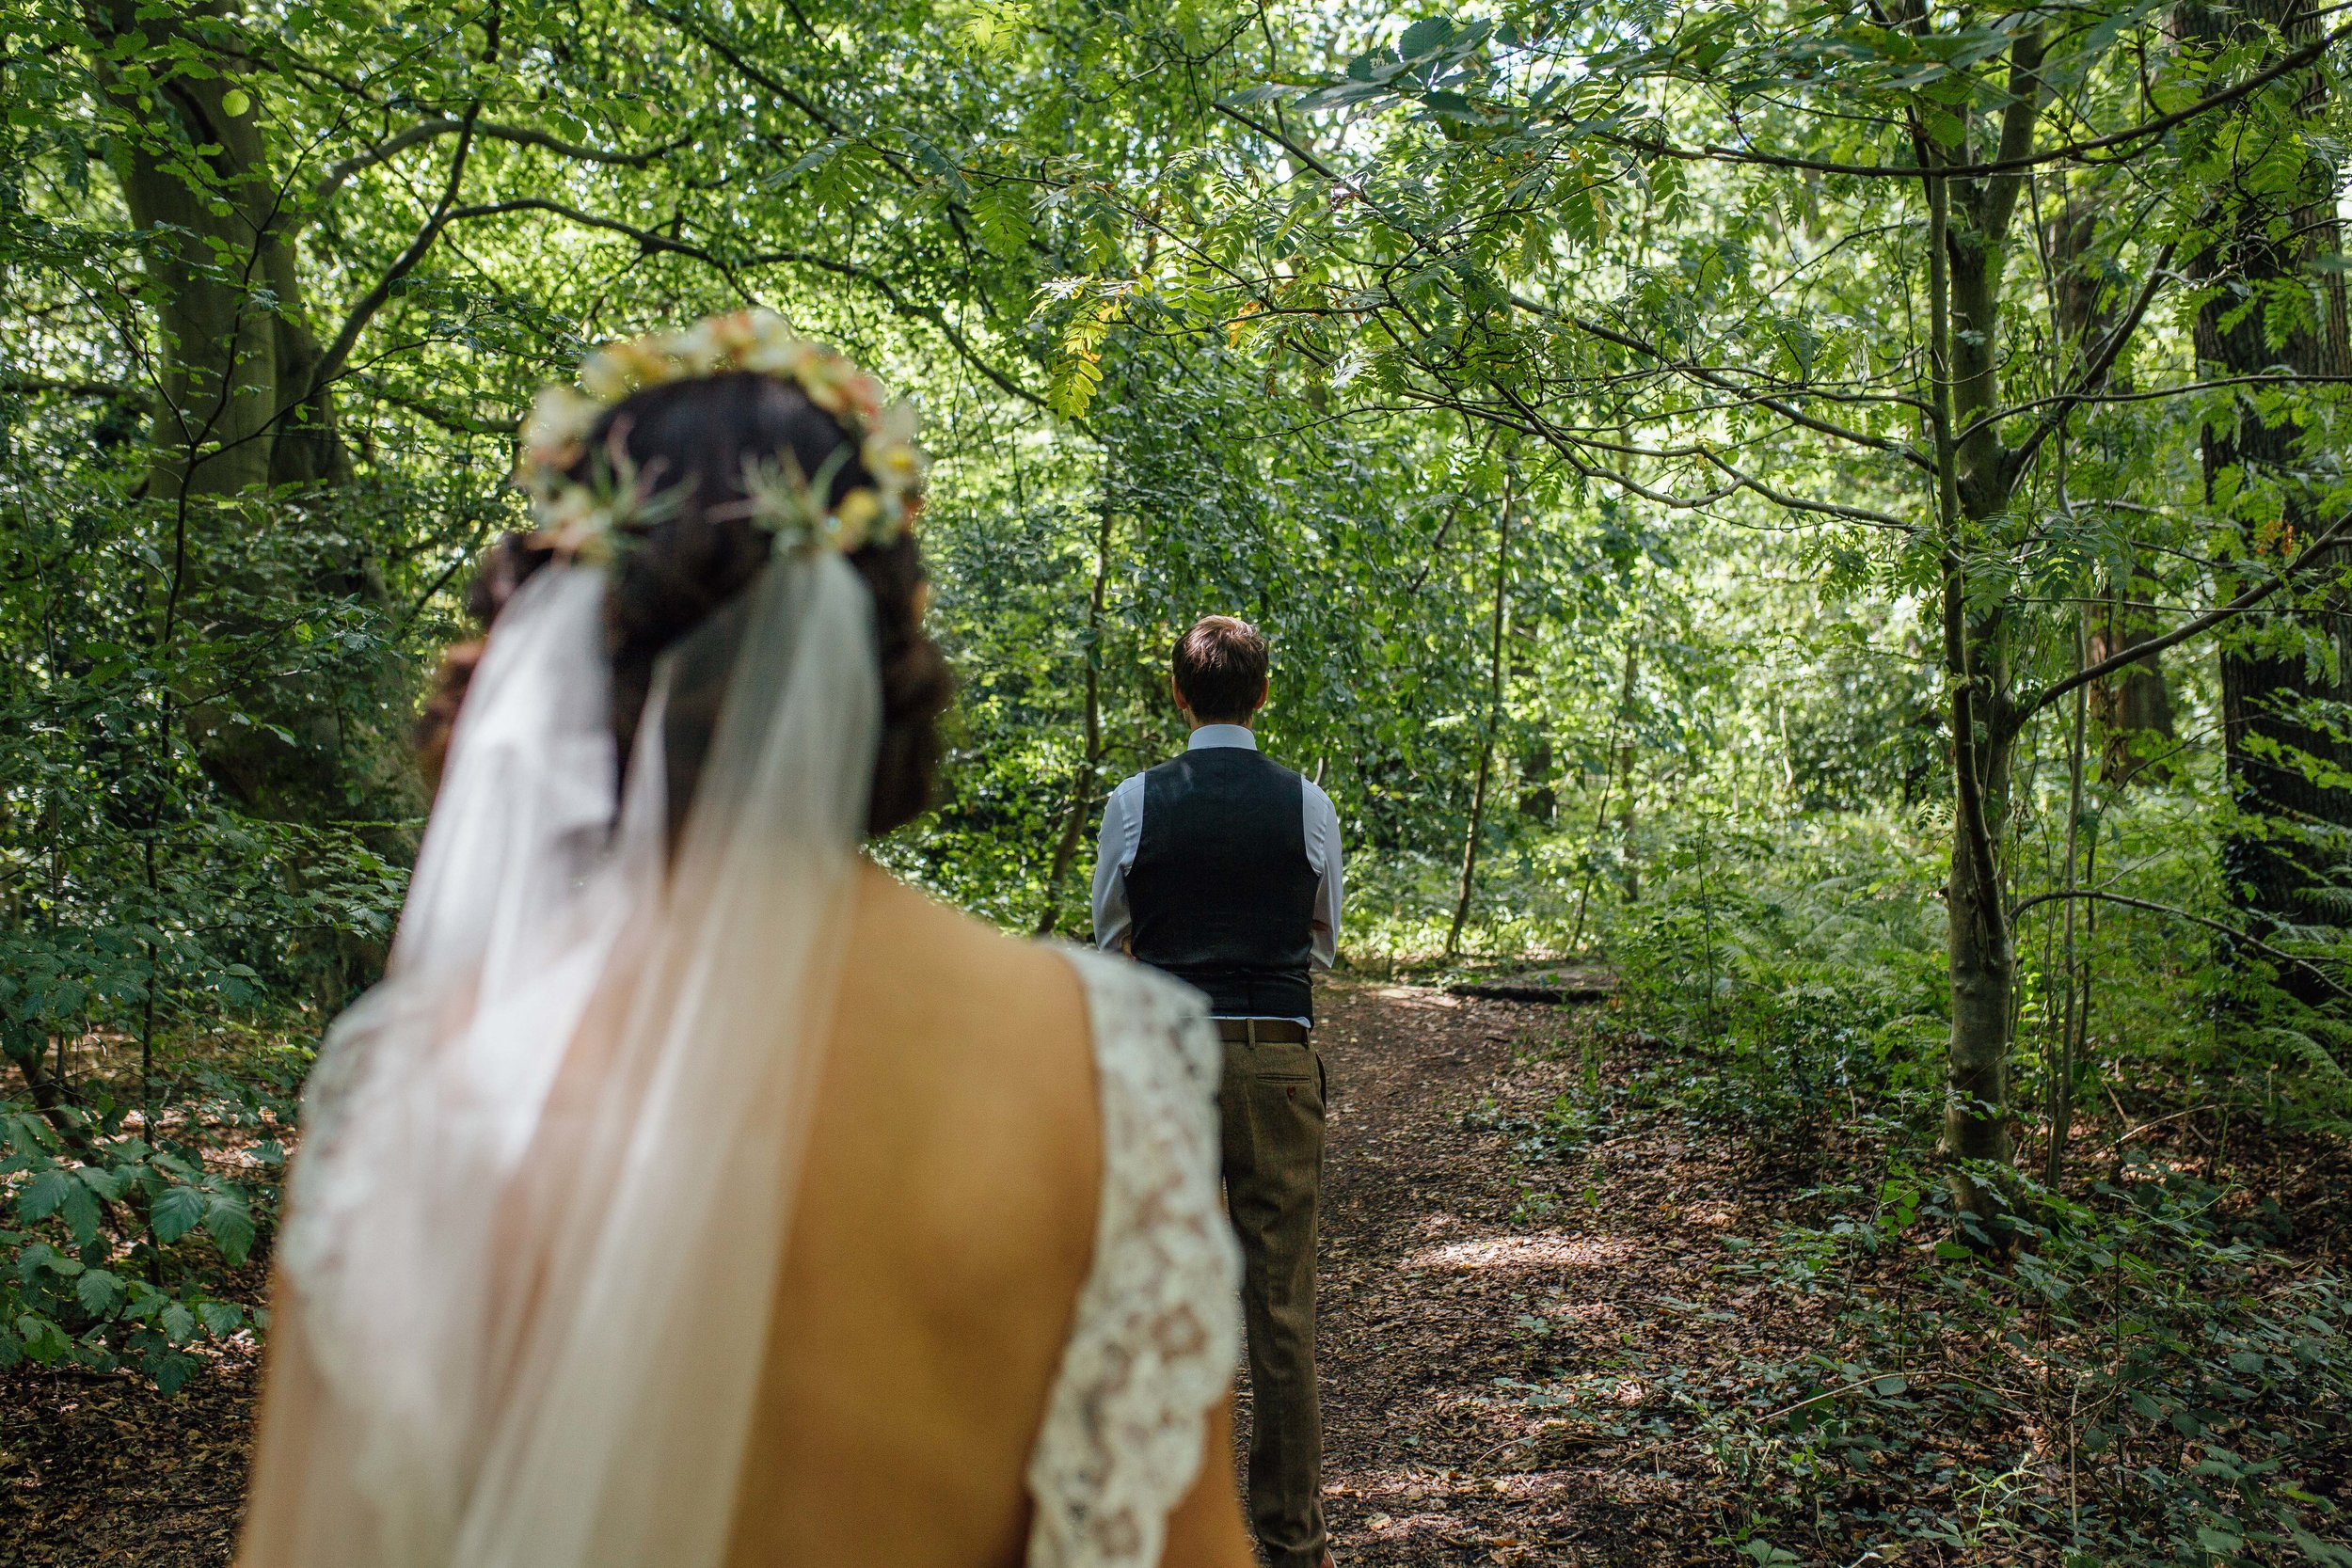 Katy-Bespoke-Veil-Sheffield-Wedding-Wes-Anderson-Susanna-Greening-Derbyshire-5